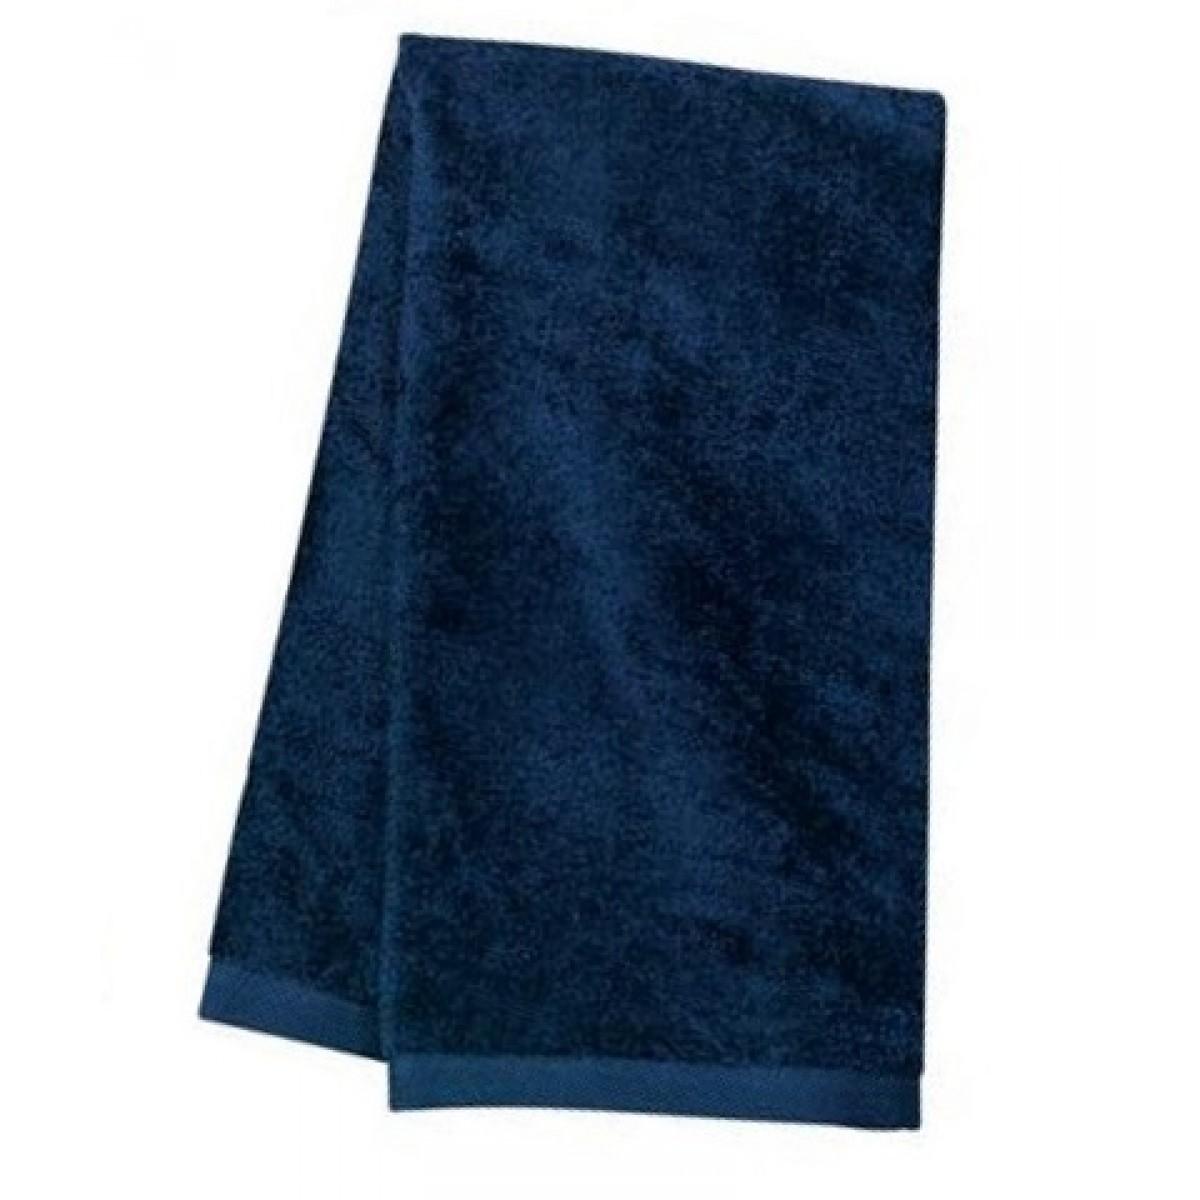 Navy Blue Terry Velour Towel